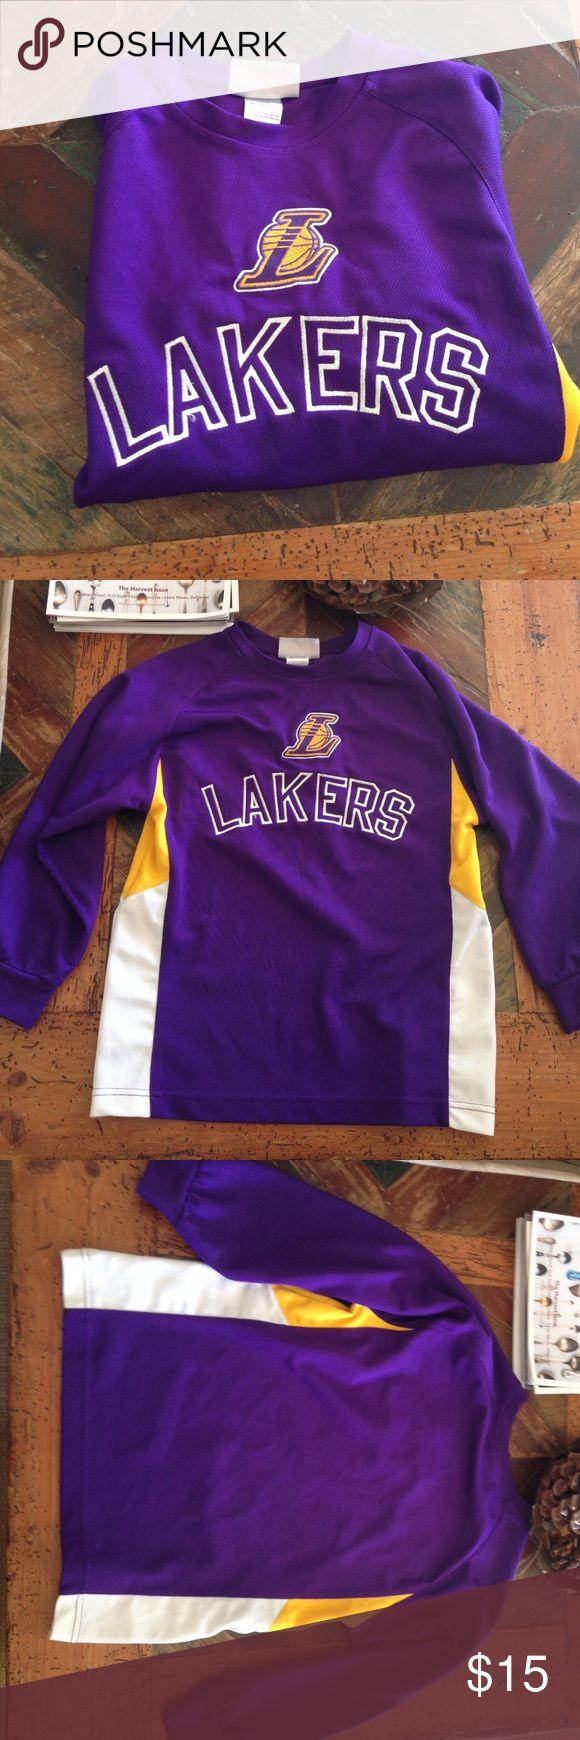 LA Laker's Shirt NBA, LA Lakers shirt, kids size small 8. Pre-loved, minimal wear (minor stain, see picture). NBA Shirts & Tops Tees - Long Sleeve